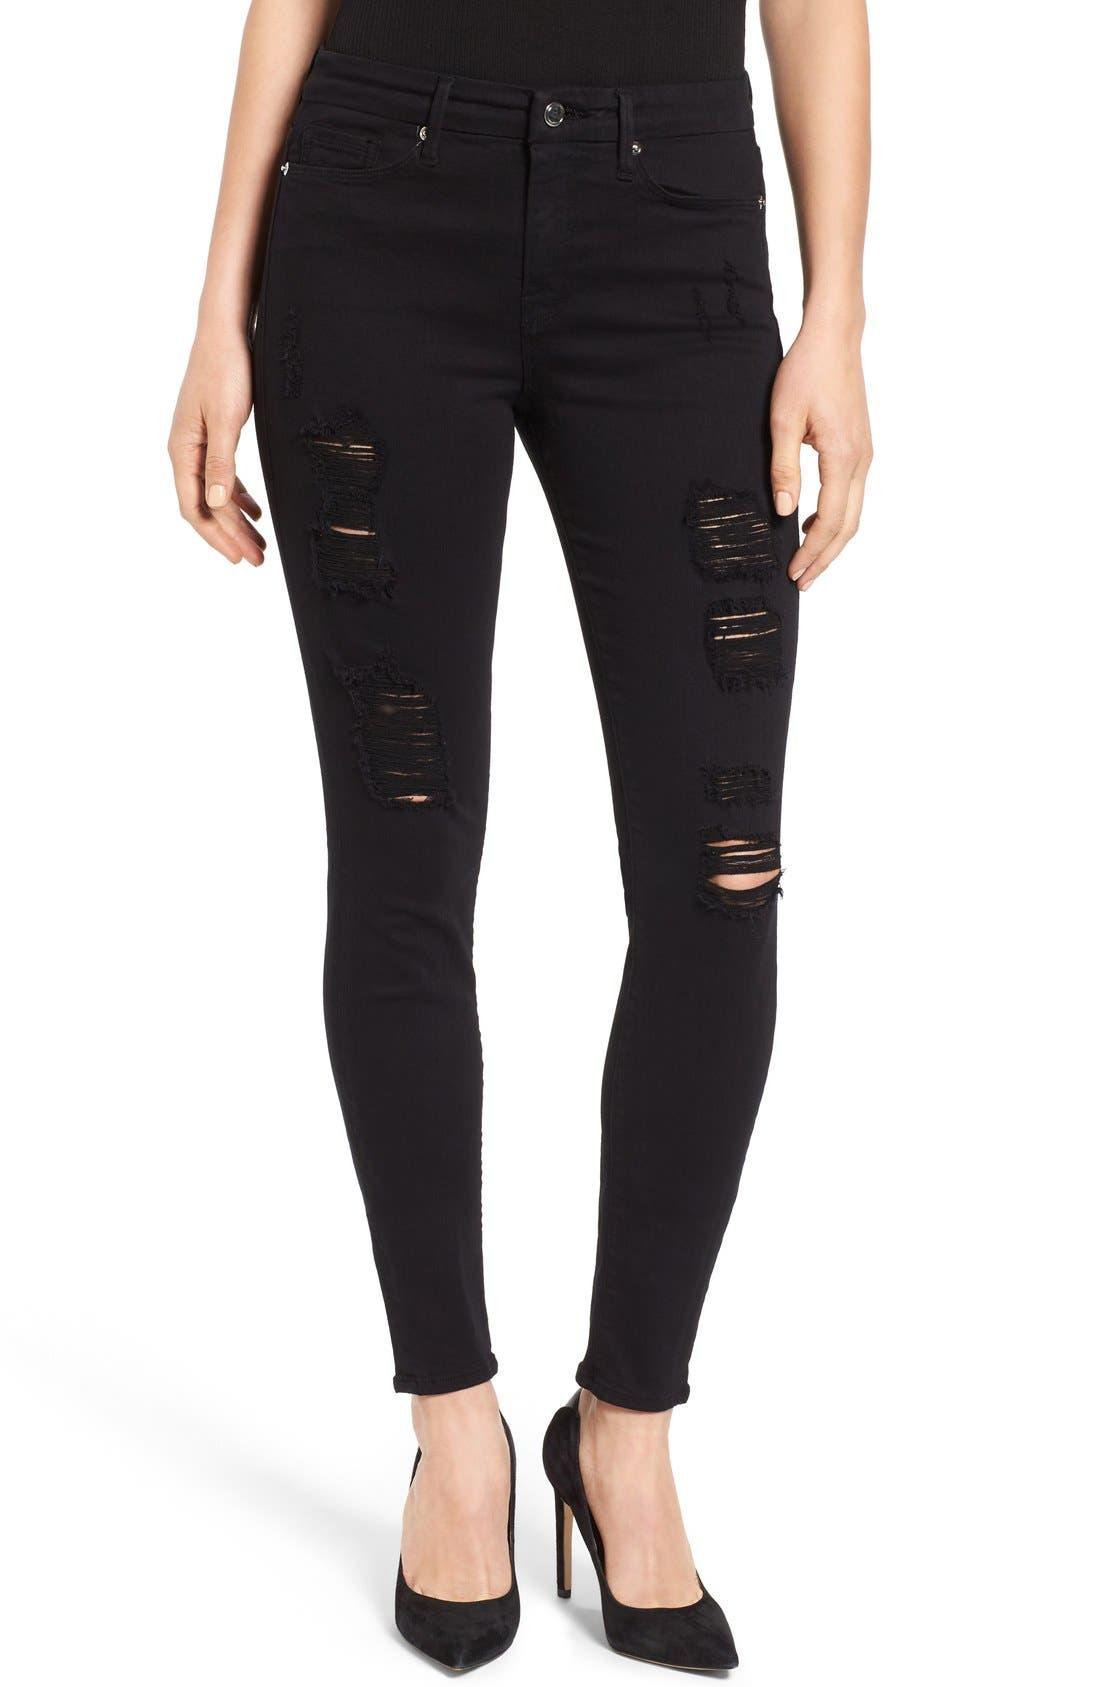 Main Image - Good American Good Legs High Rise Ripped Skinny Jeans (Black 002)